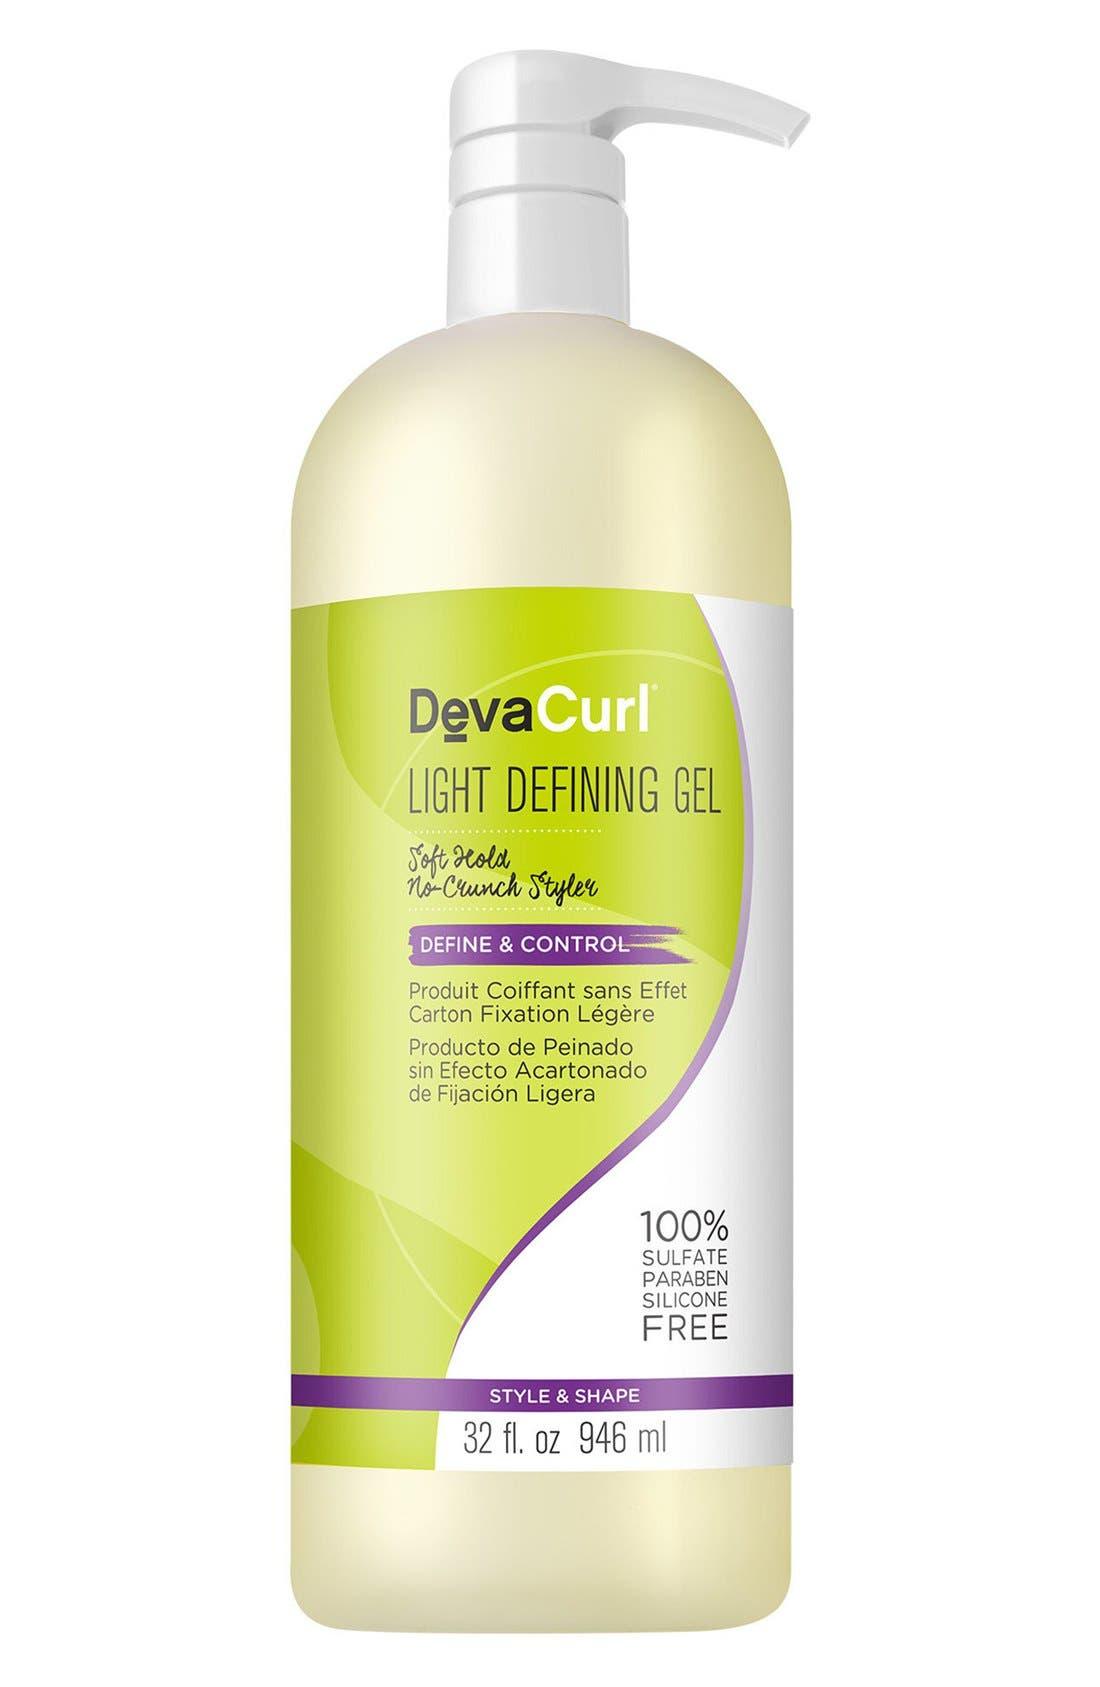 DevaCurl Light Defining Gel Soft Hold No-Crunch Styler